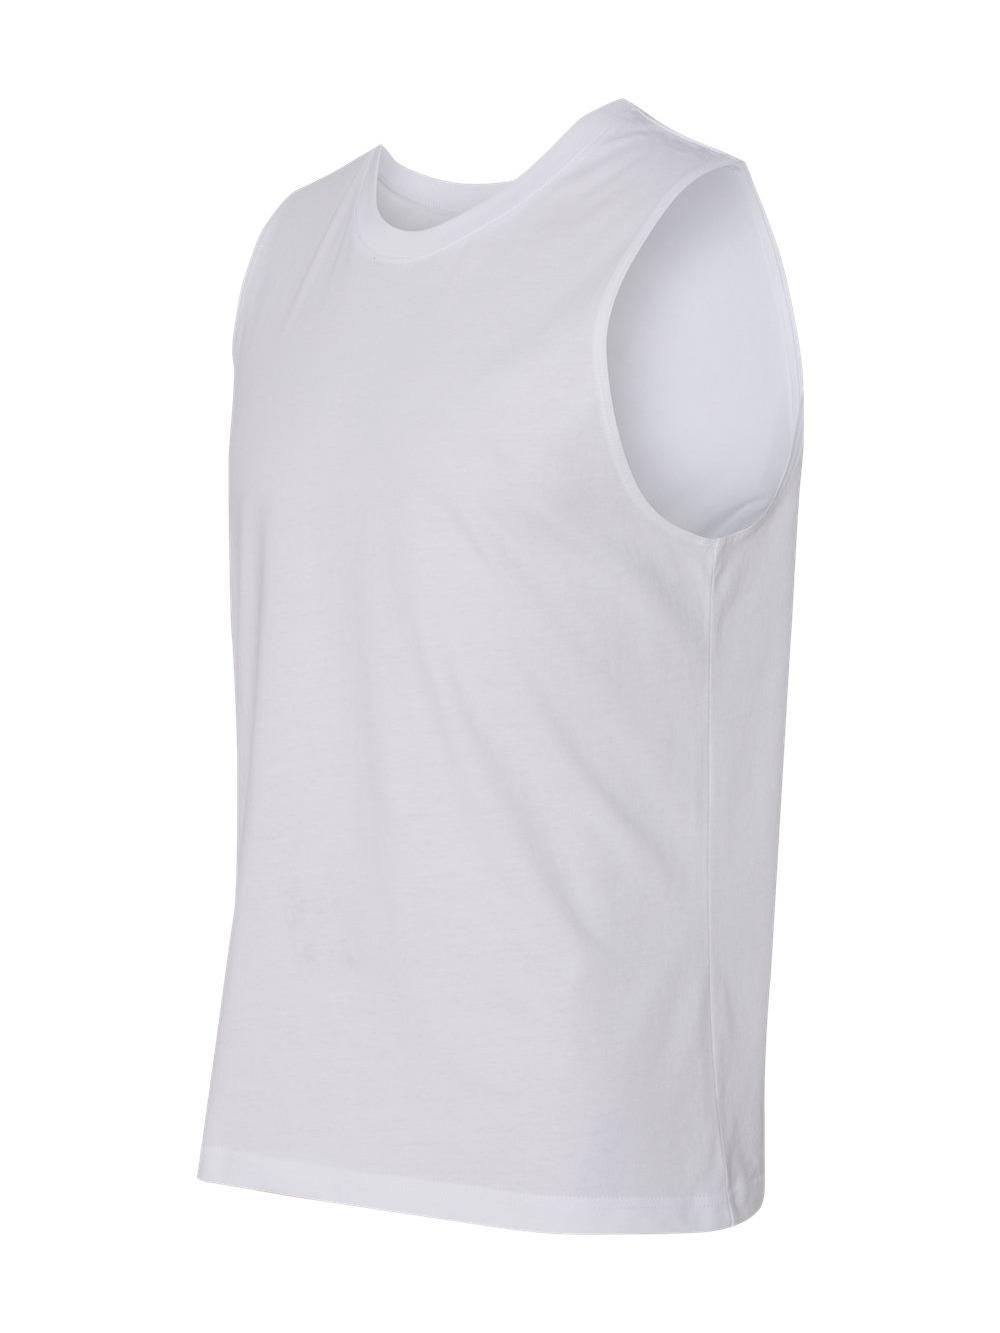 White Mens Sleeveless Shirt